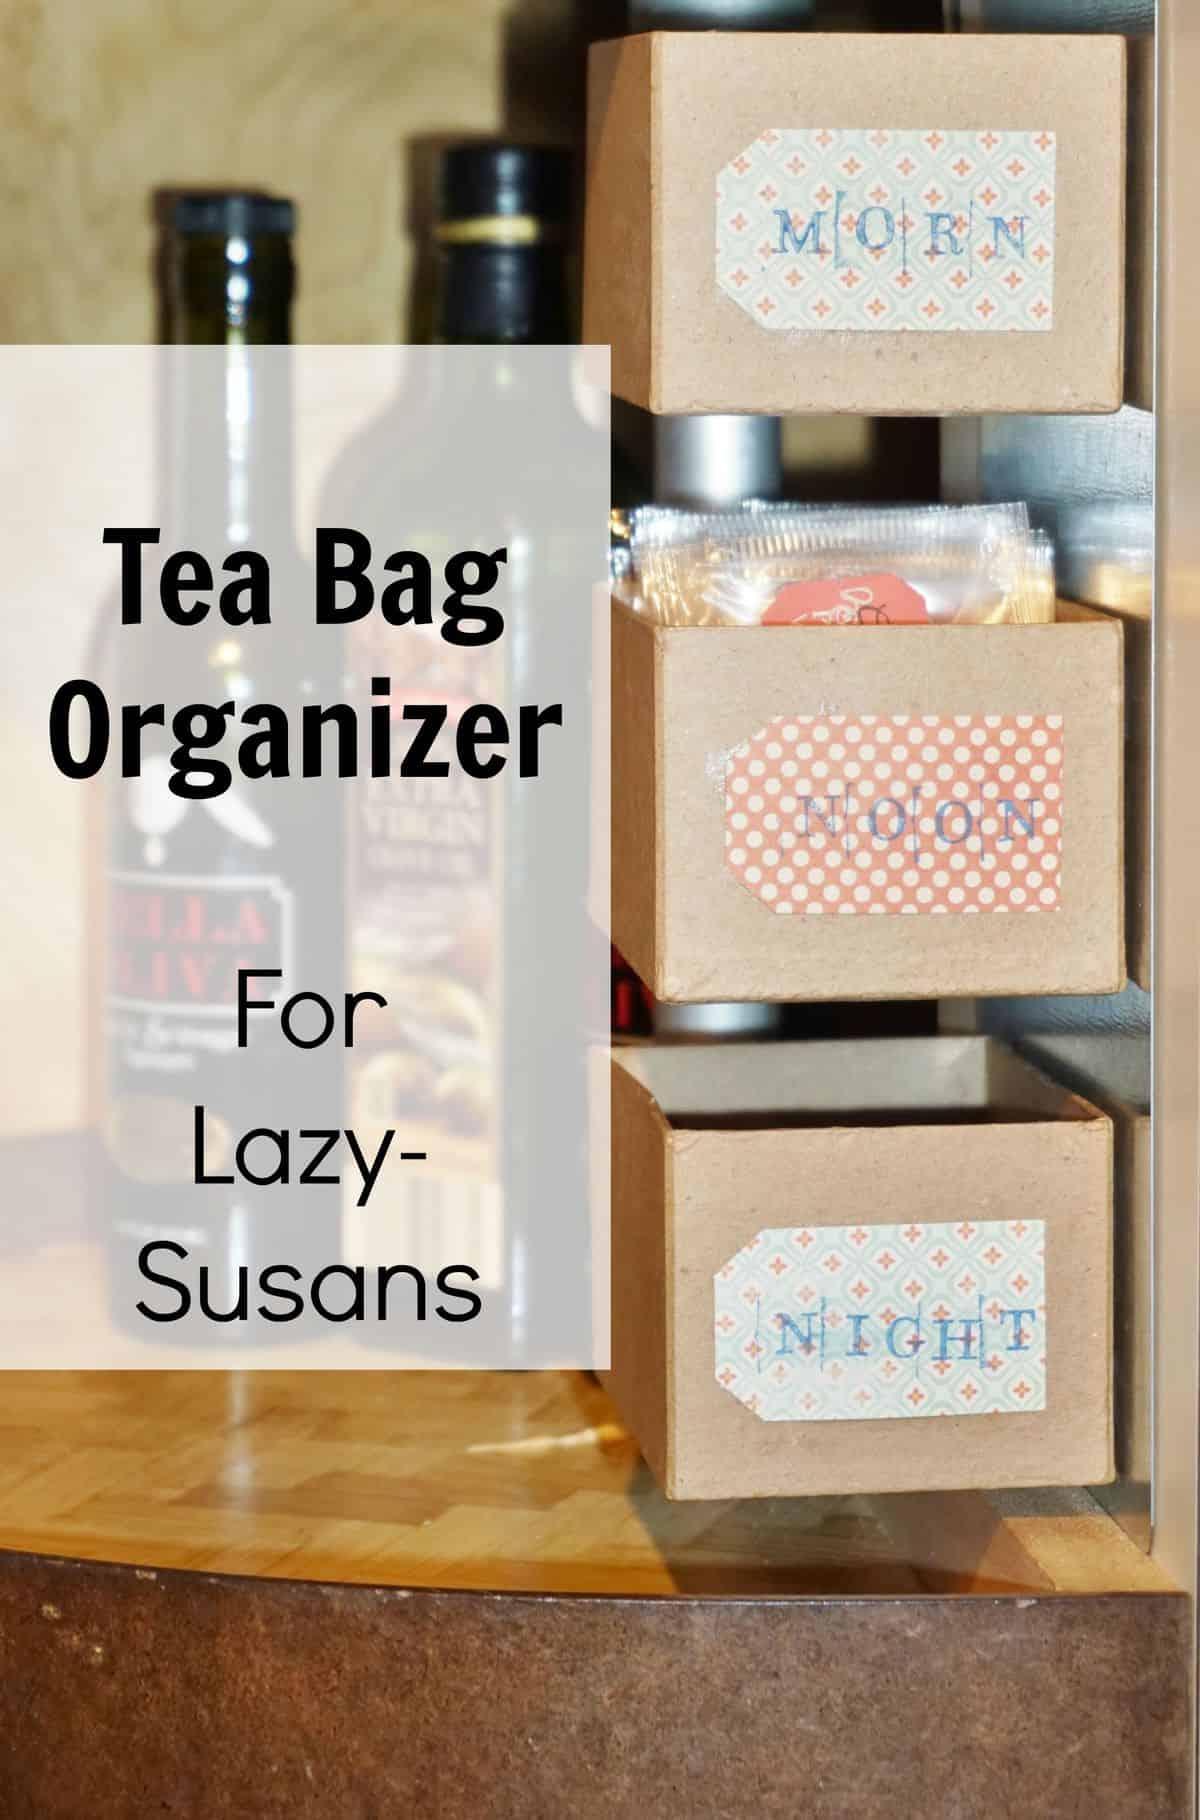 Tea Bag Organizer For Lazy Susans